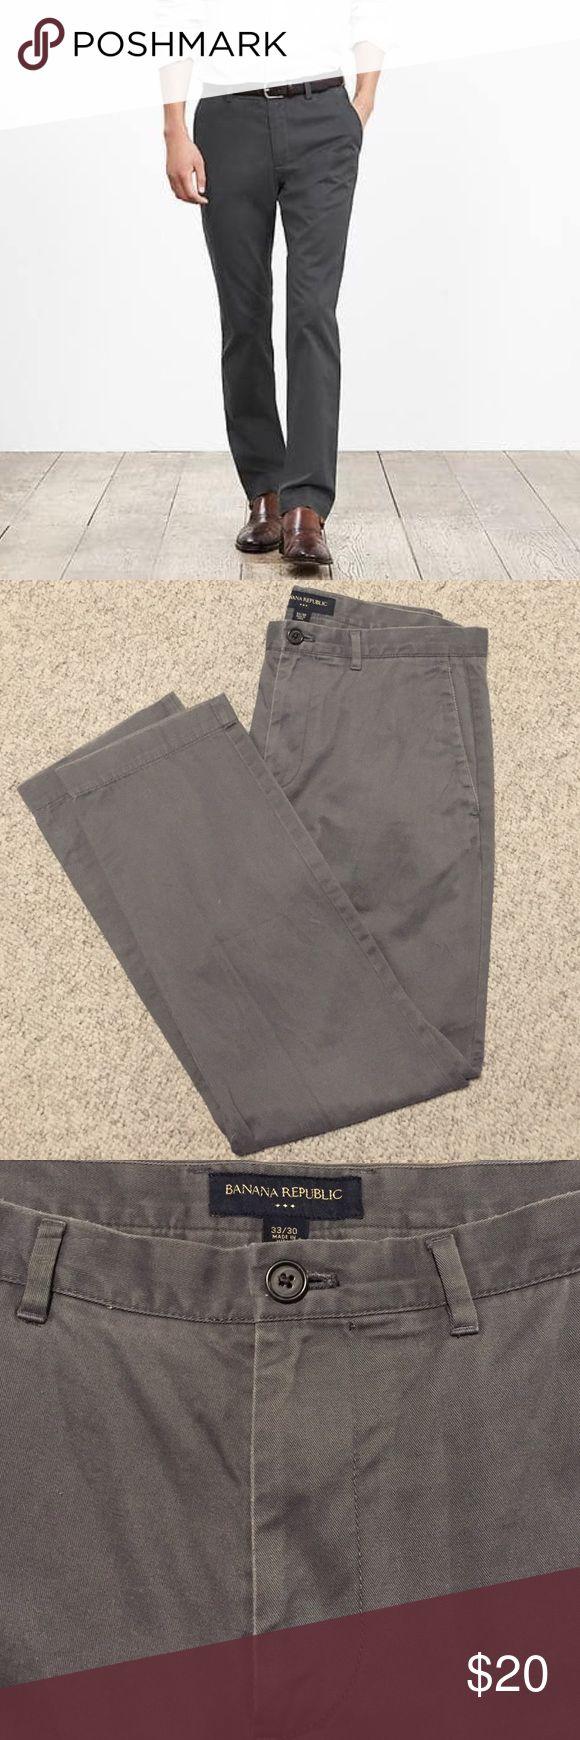 Men's Banana Republic Grey Slim Straight Chinos 33x30 Excellent Used Condition. Banana Republic Pants Chinos & Khakis